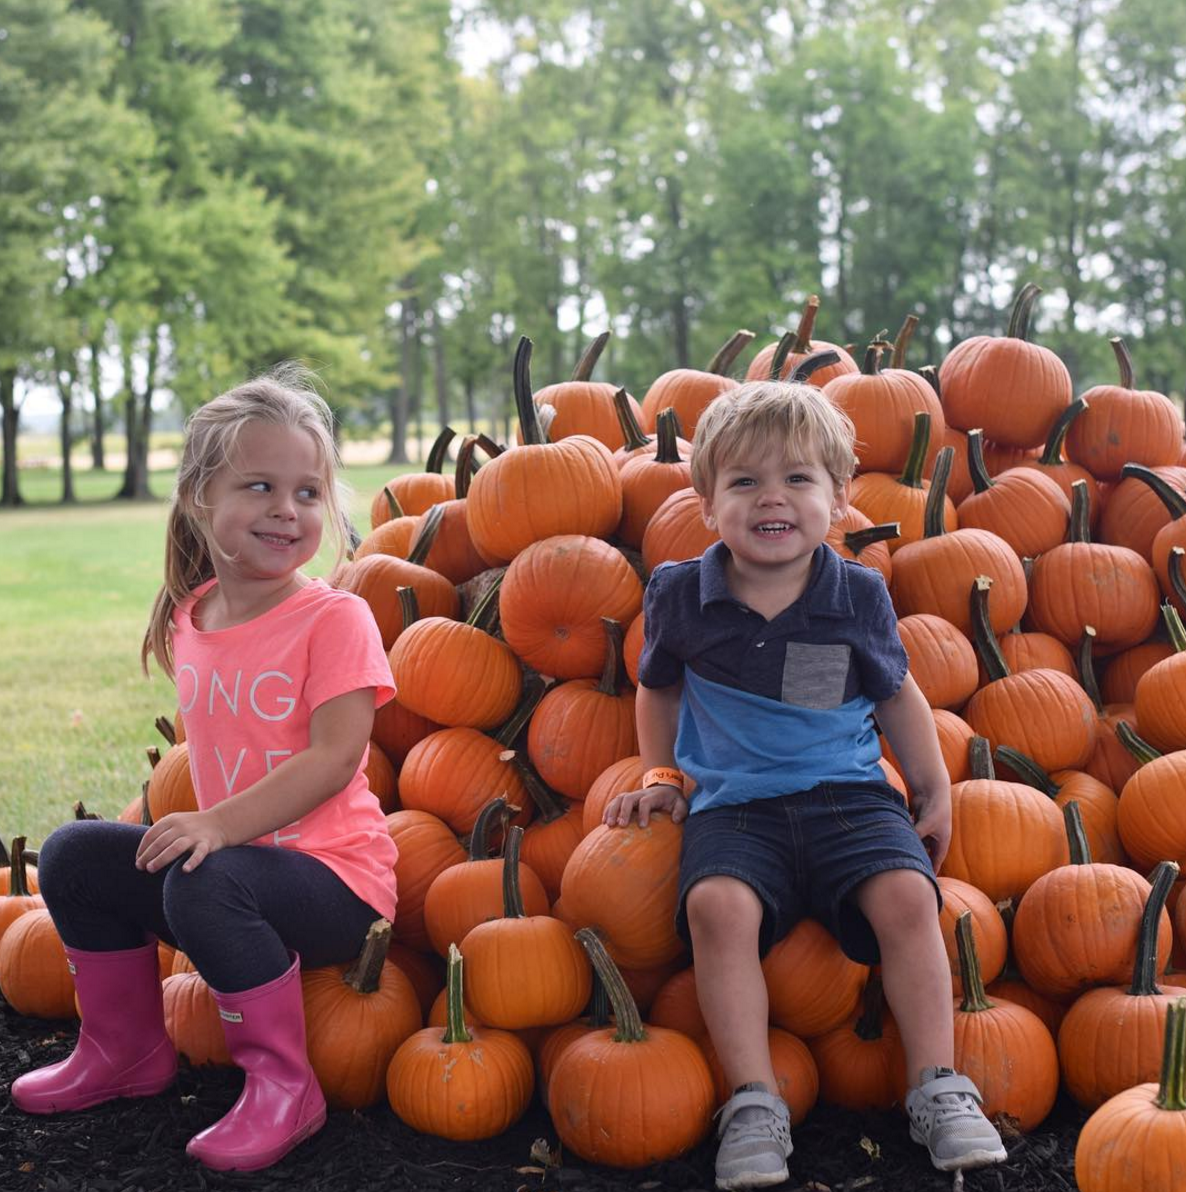 Photo by @littleadvcbus at Lehner's Pumpkin Farm in Radnor, Ohio